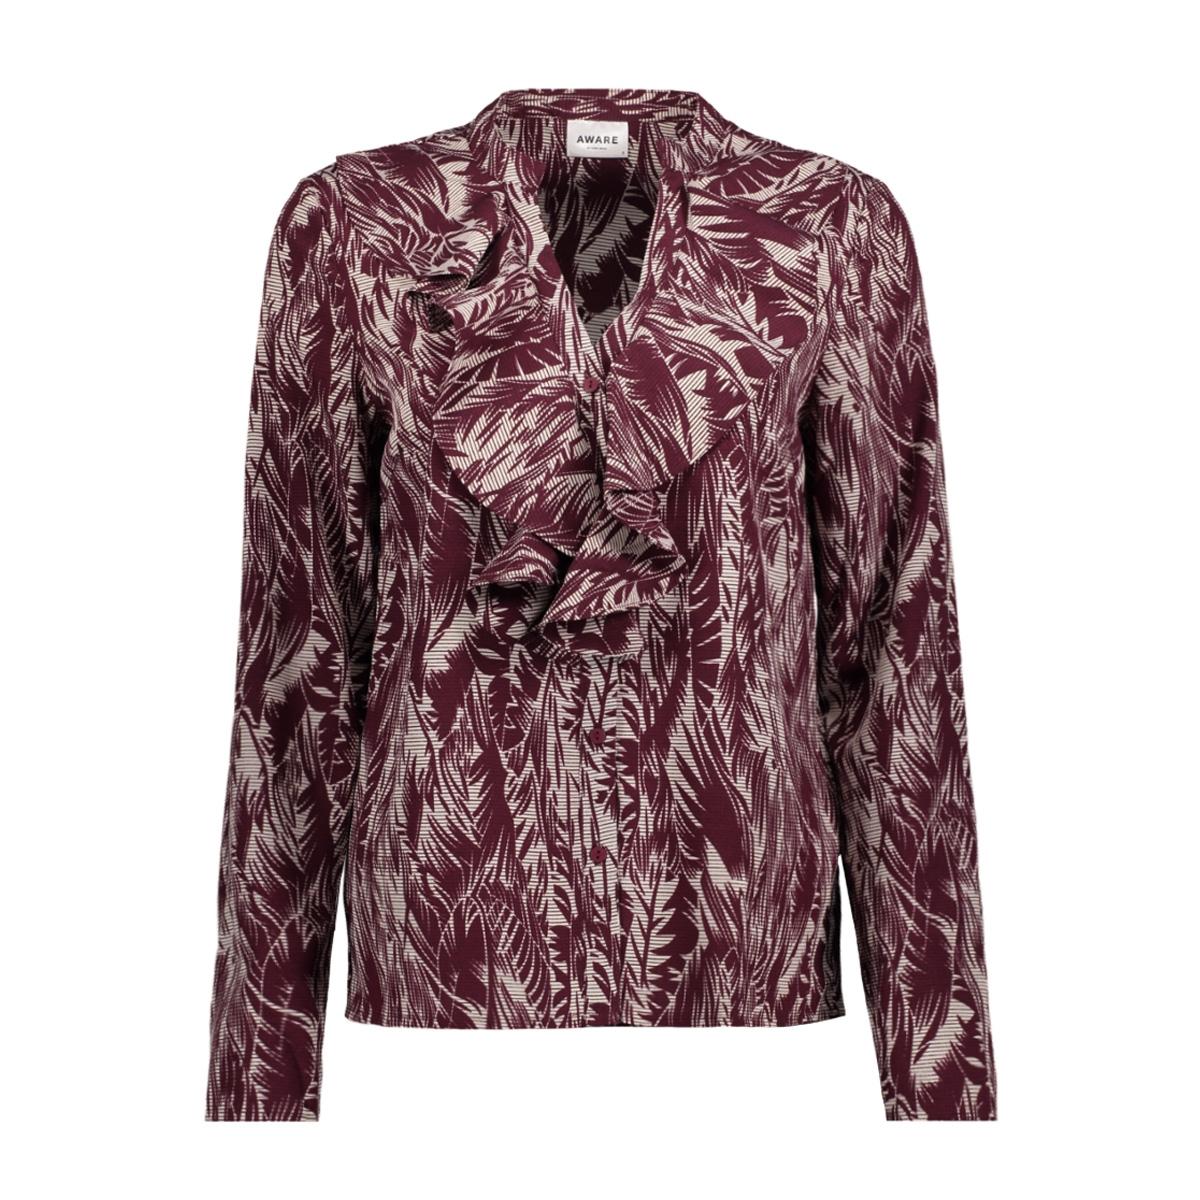 vmenjoy l/s v neck blouse ga 10202999 vero moda blouse eggnog/palm winetasting